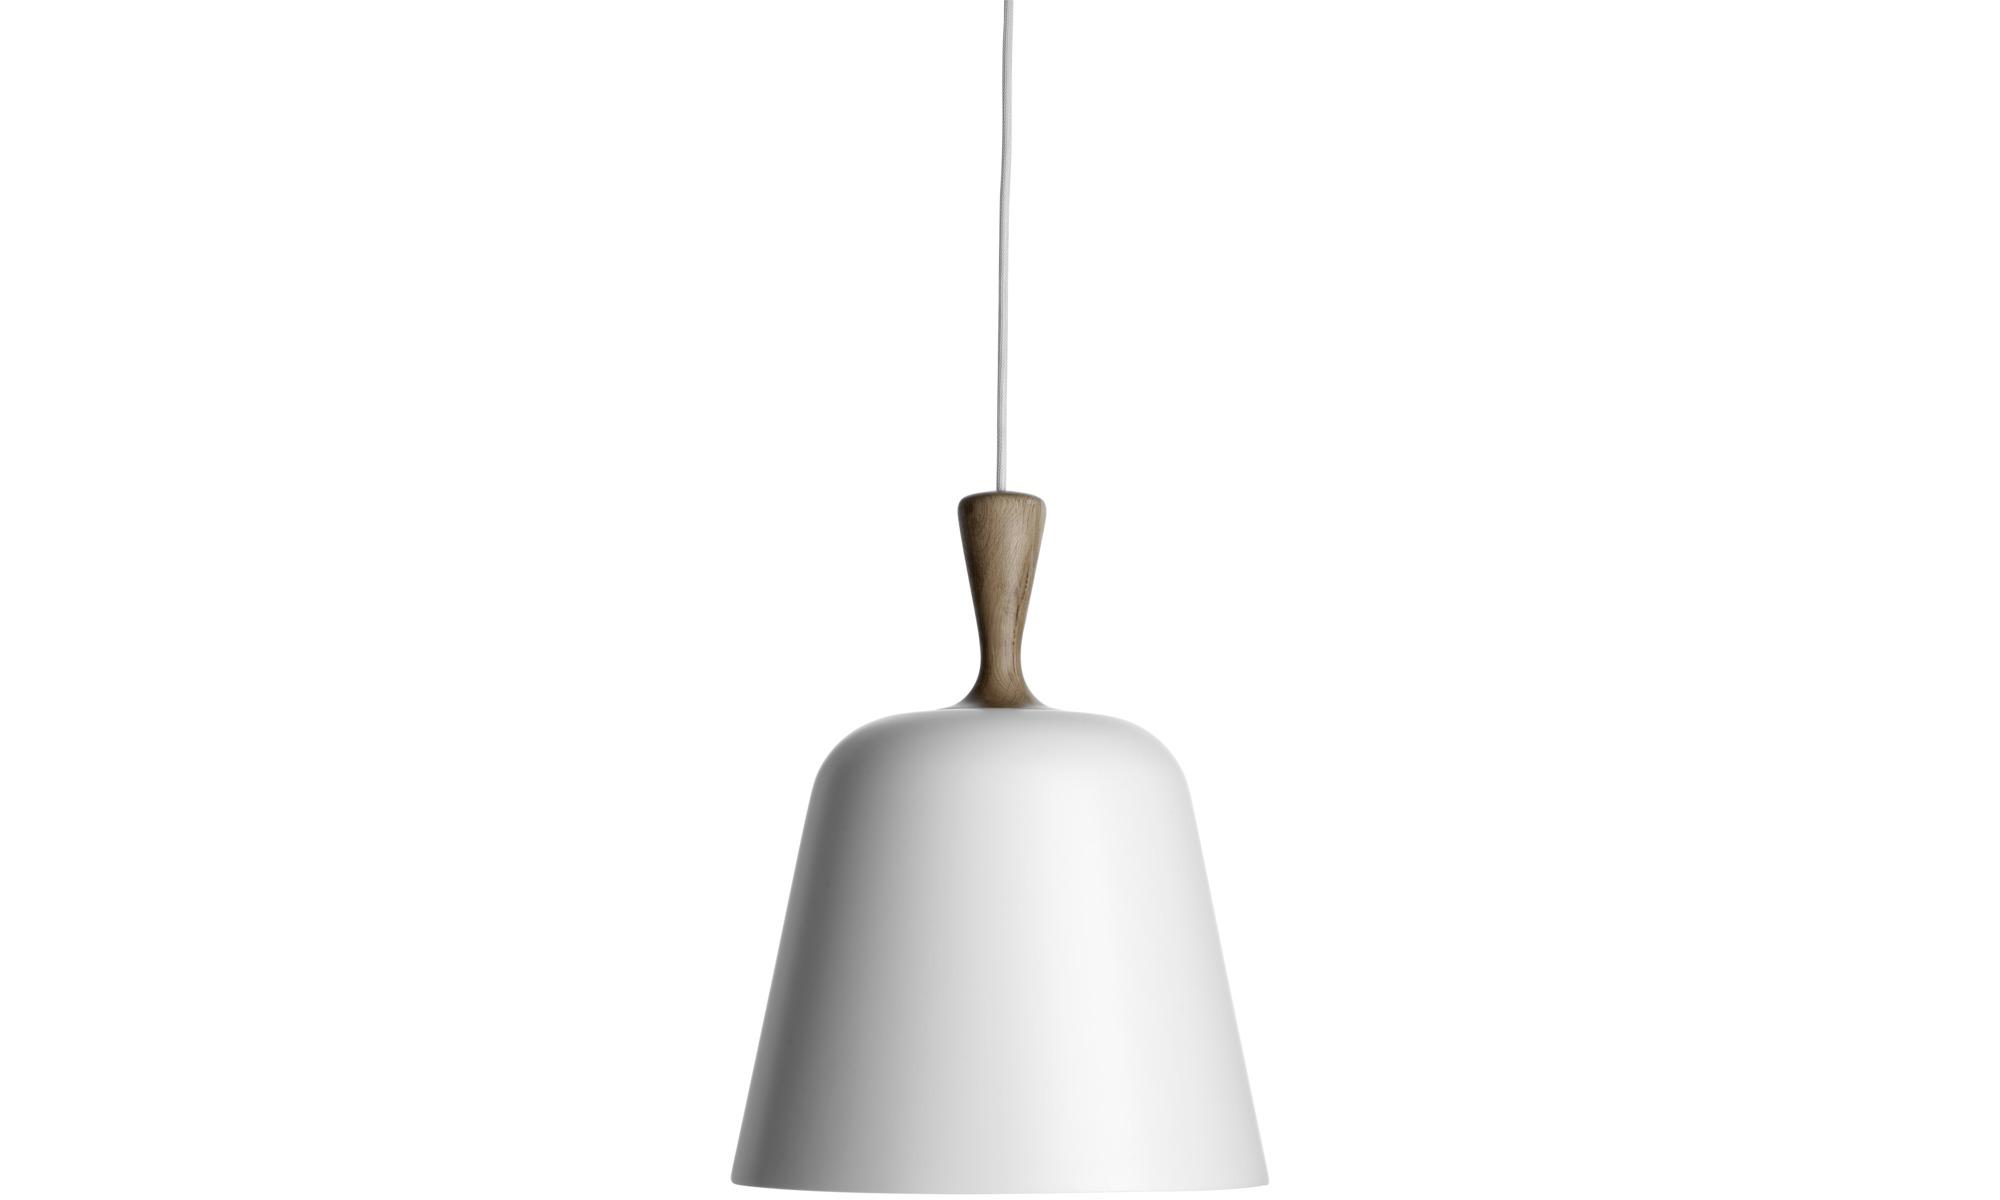 Lampy - lampa wisząca Handle Me - Biały - Metal